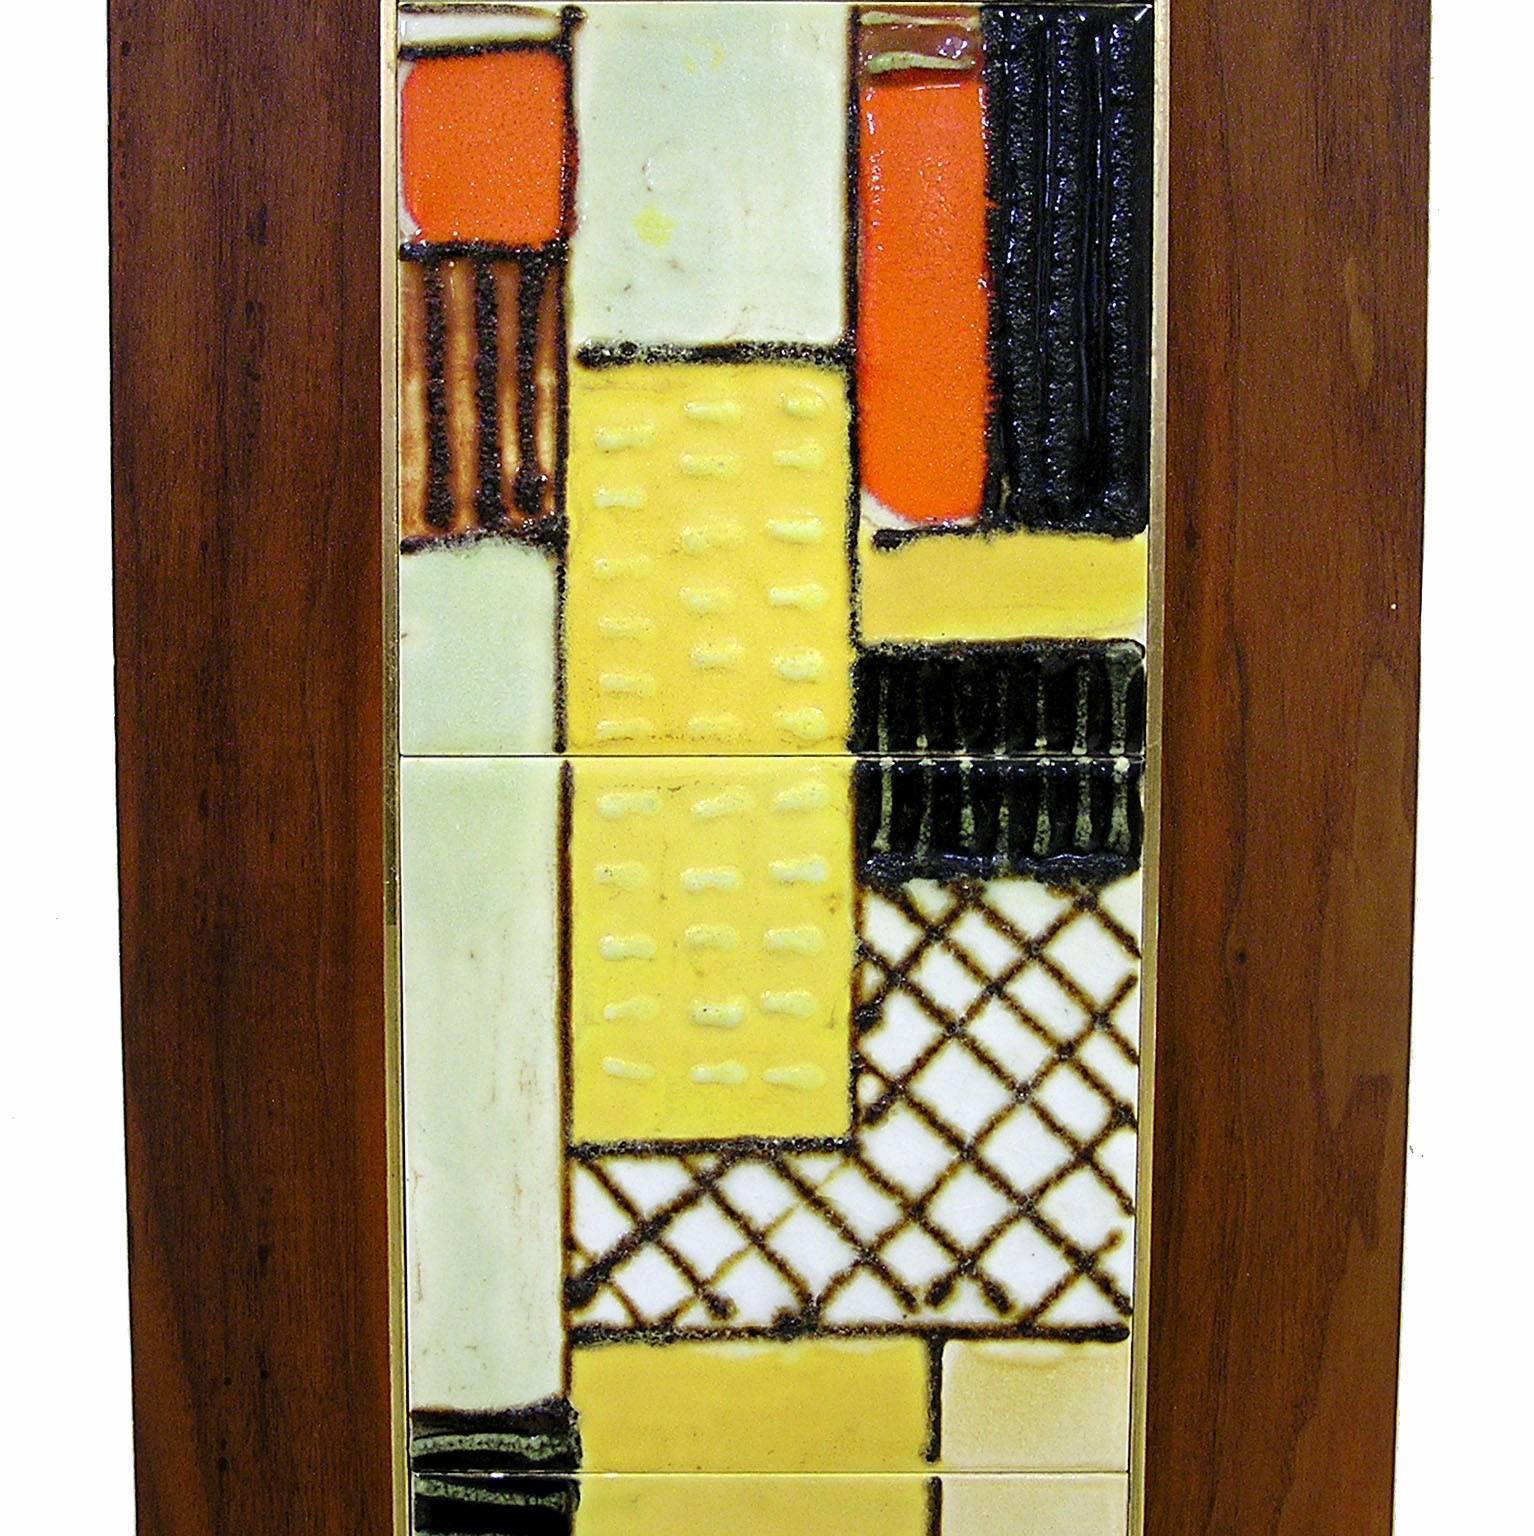 Best Ceramic Tile Wall Art Photos - The Wall Art Decorations ...